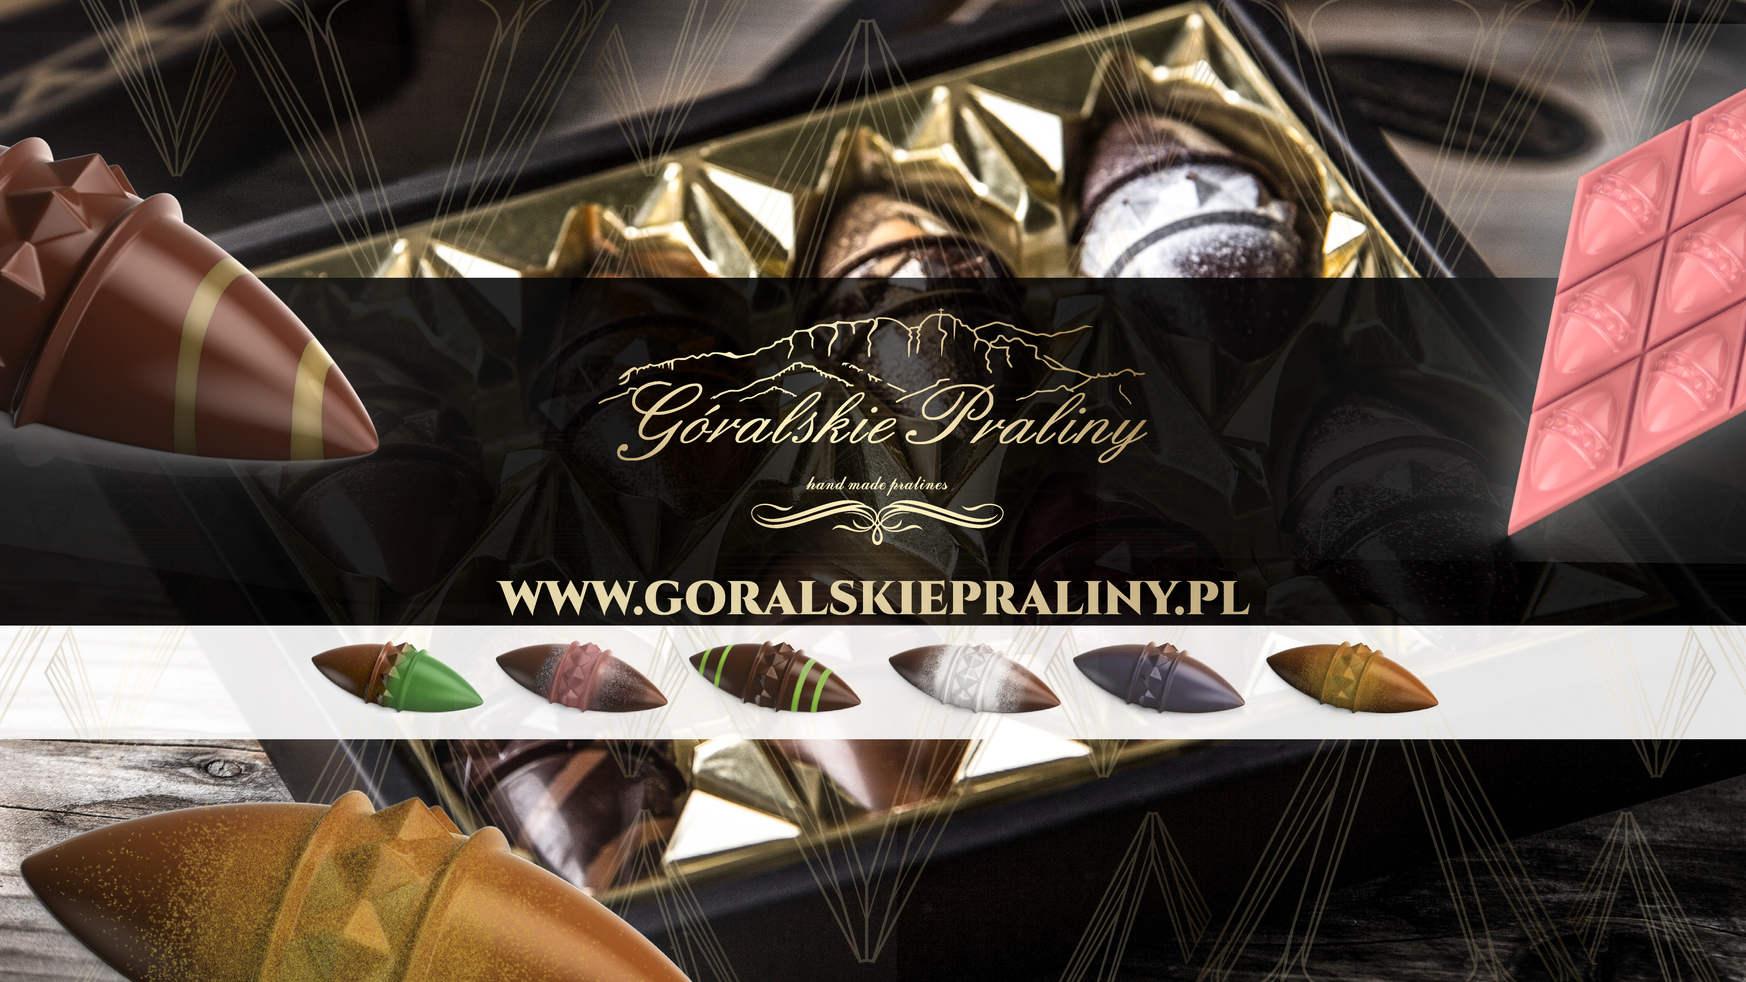 GORALSKIE-PRALINY.jpg